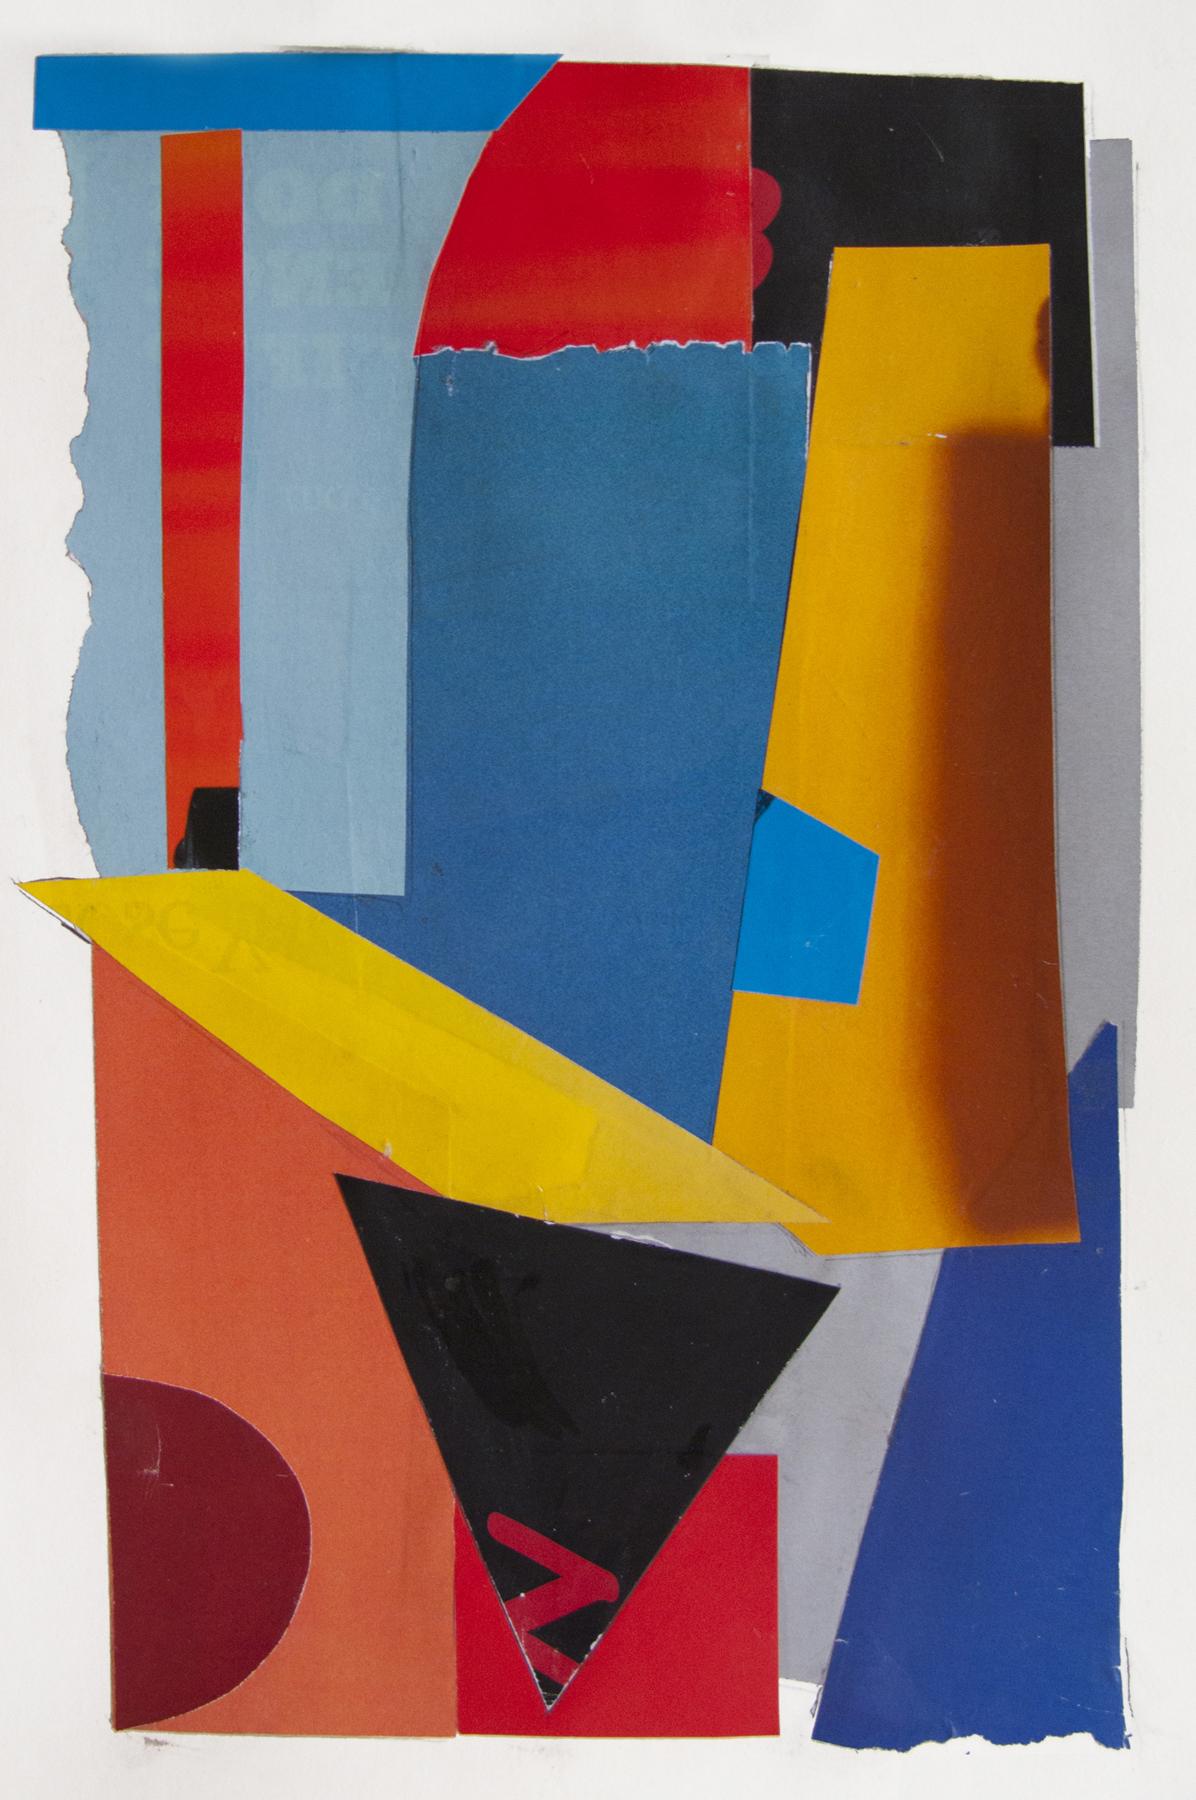 N , collage, 2012